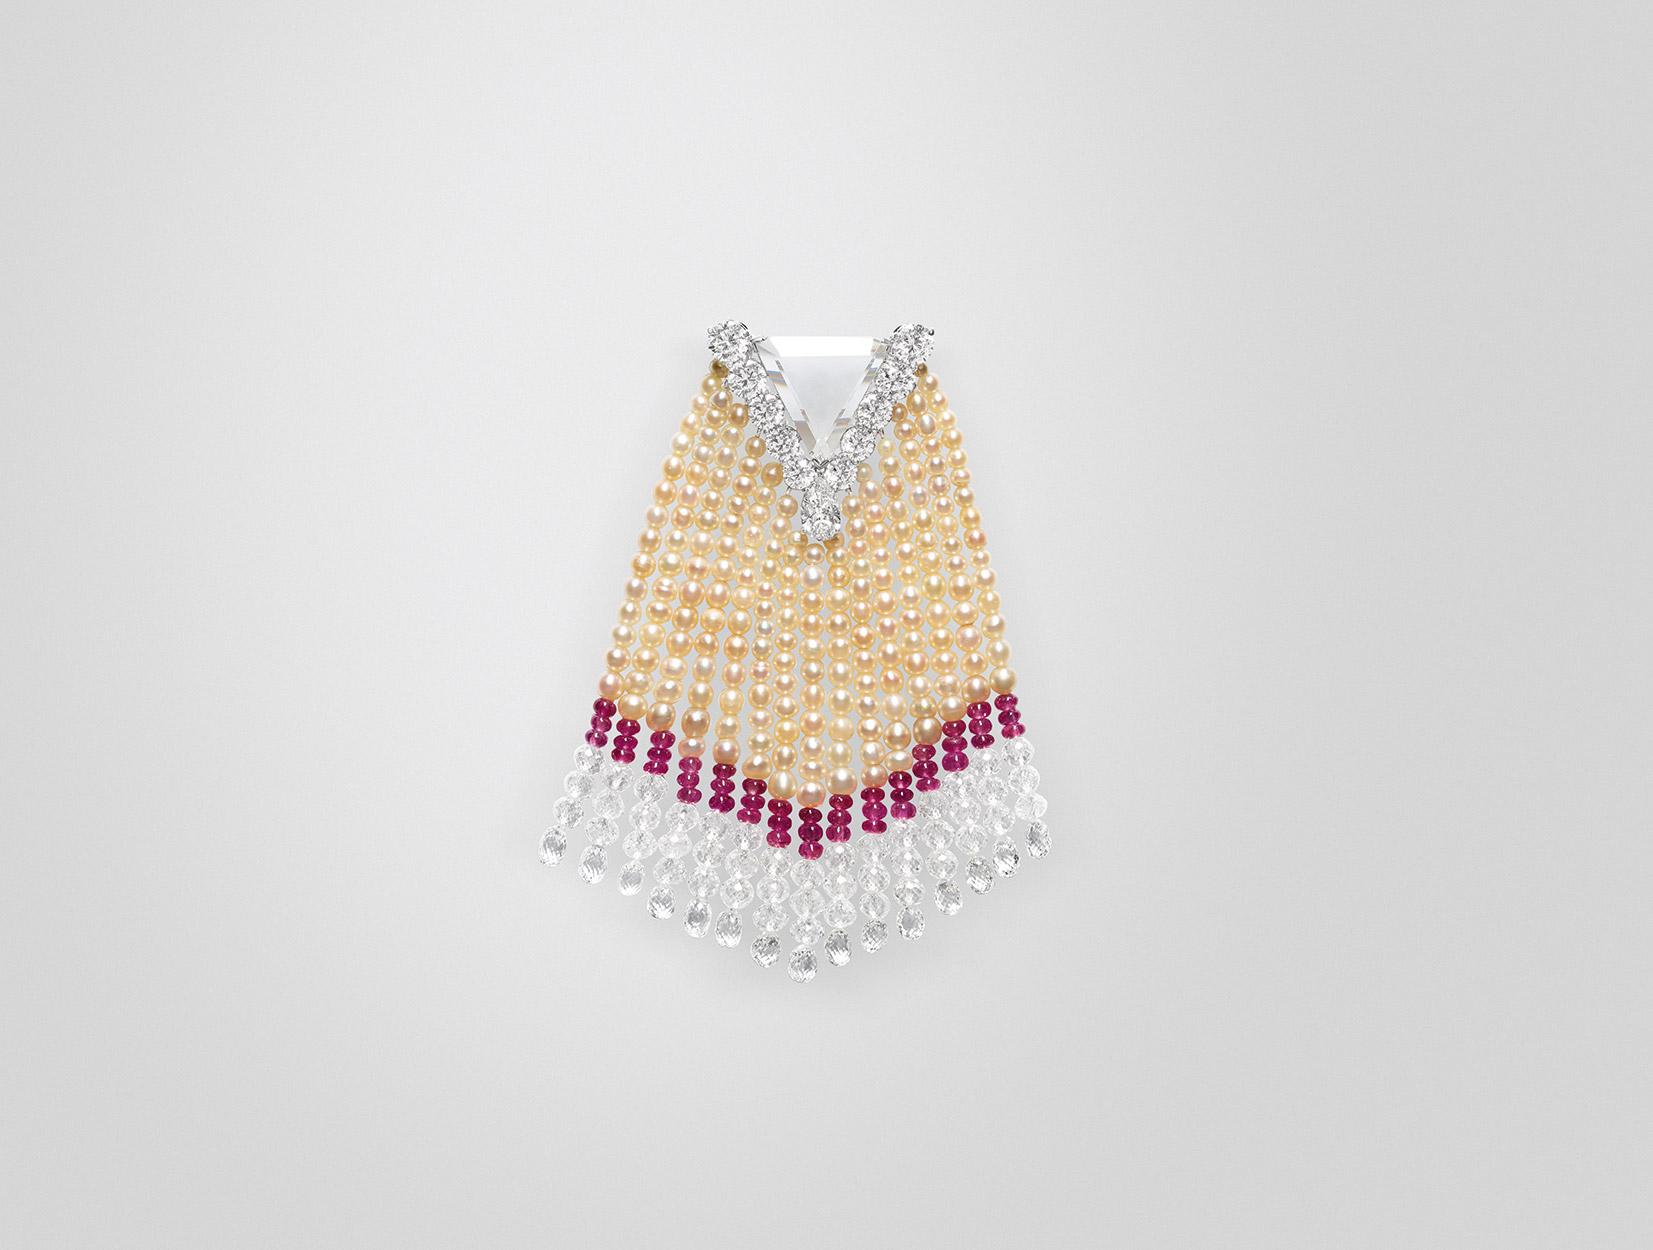 Pearls Brooch 02 | Maria Gaspari